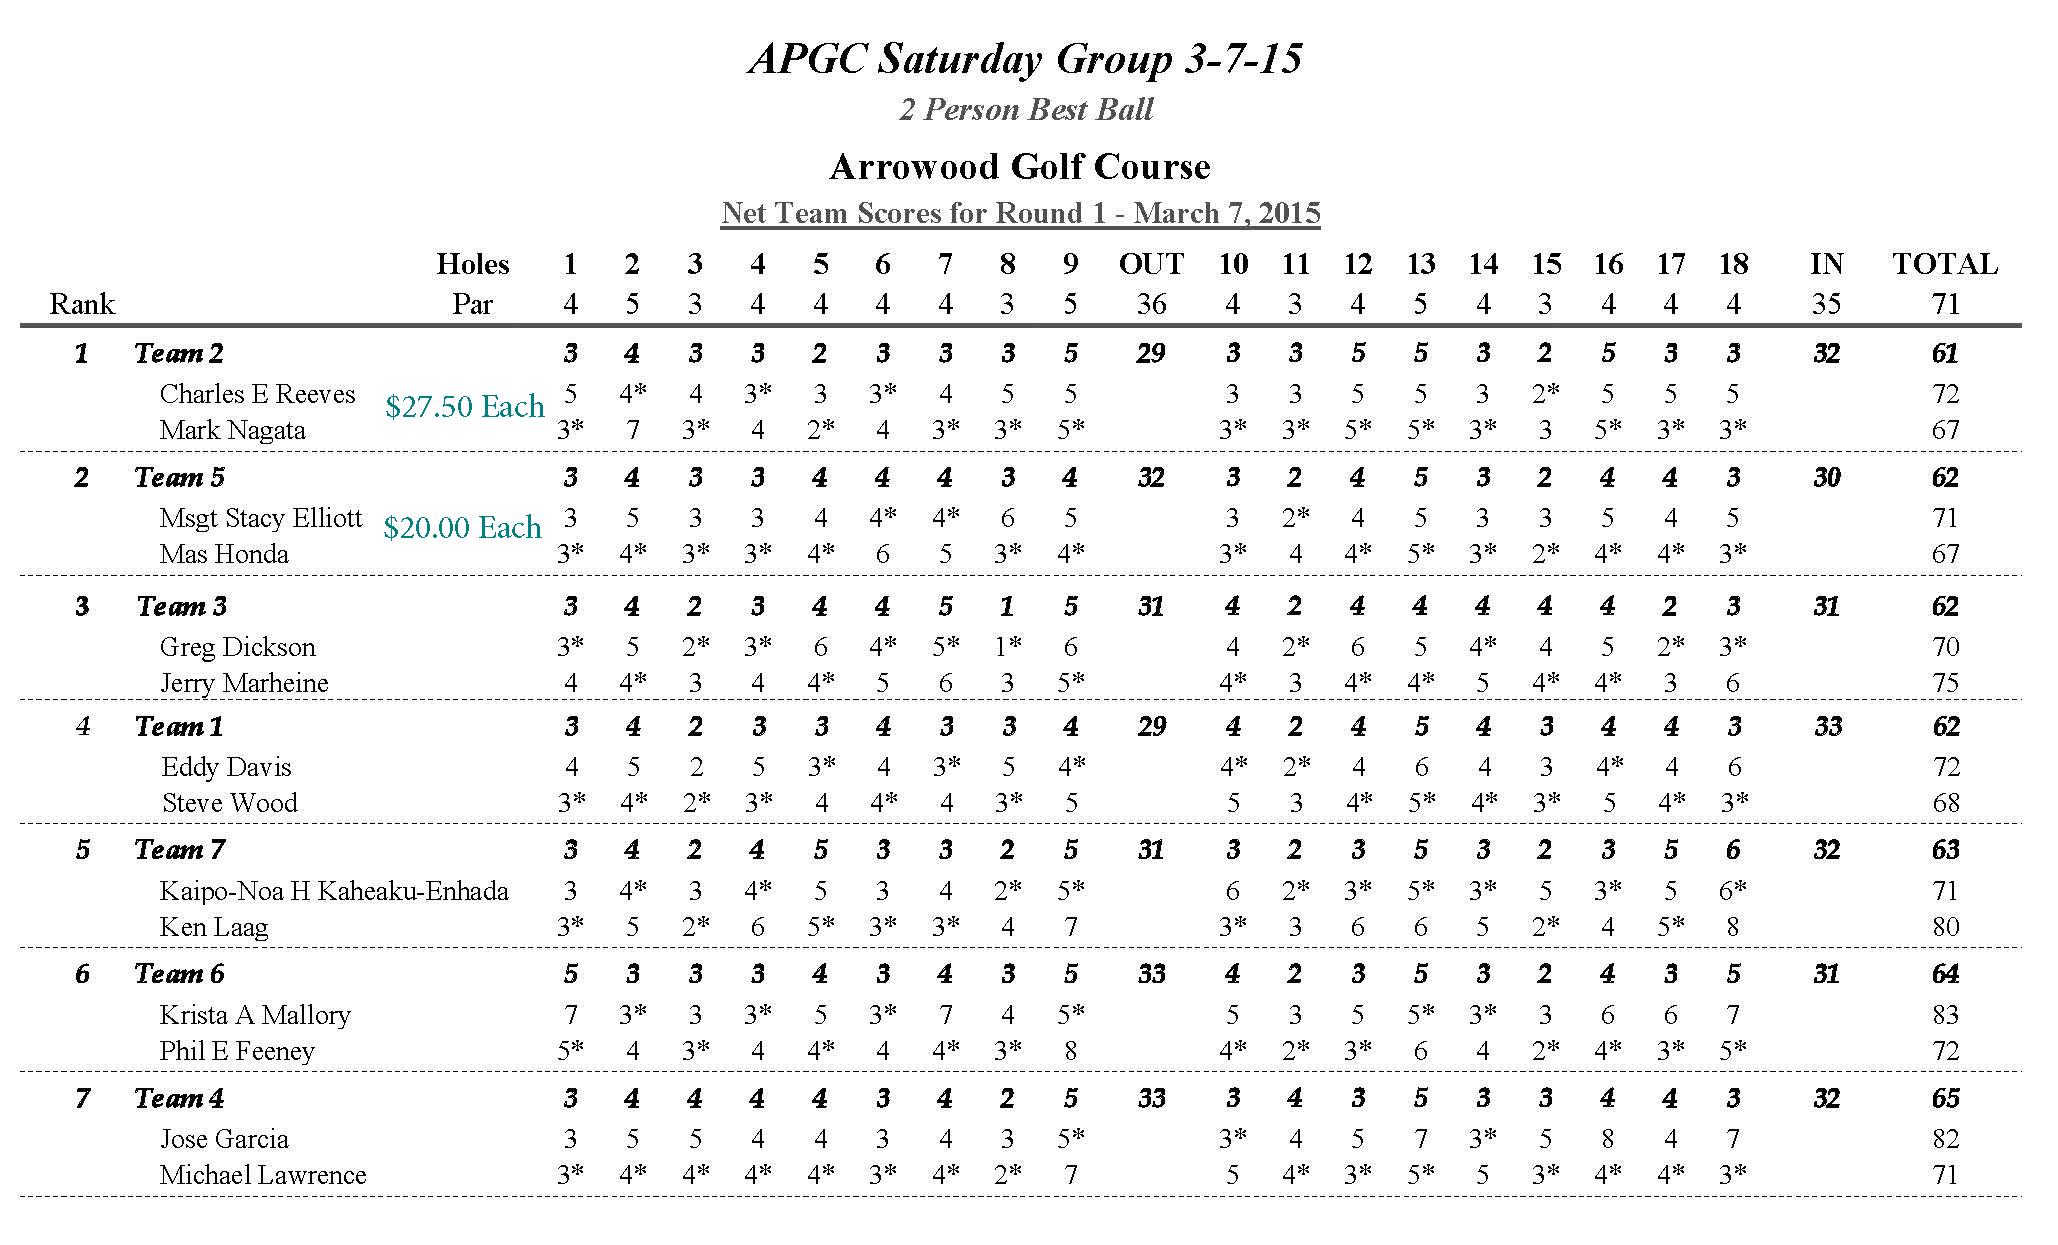 APGC Saturday 3-7-15